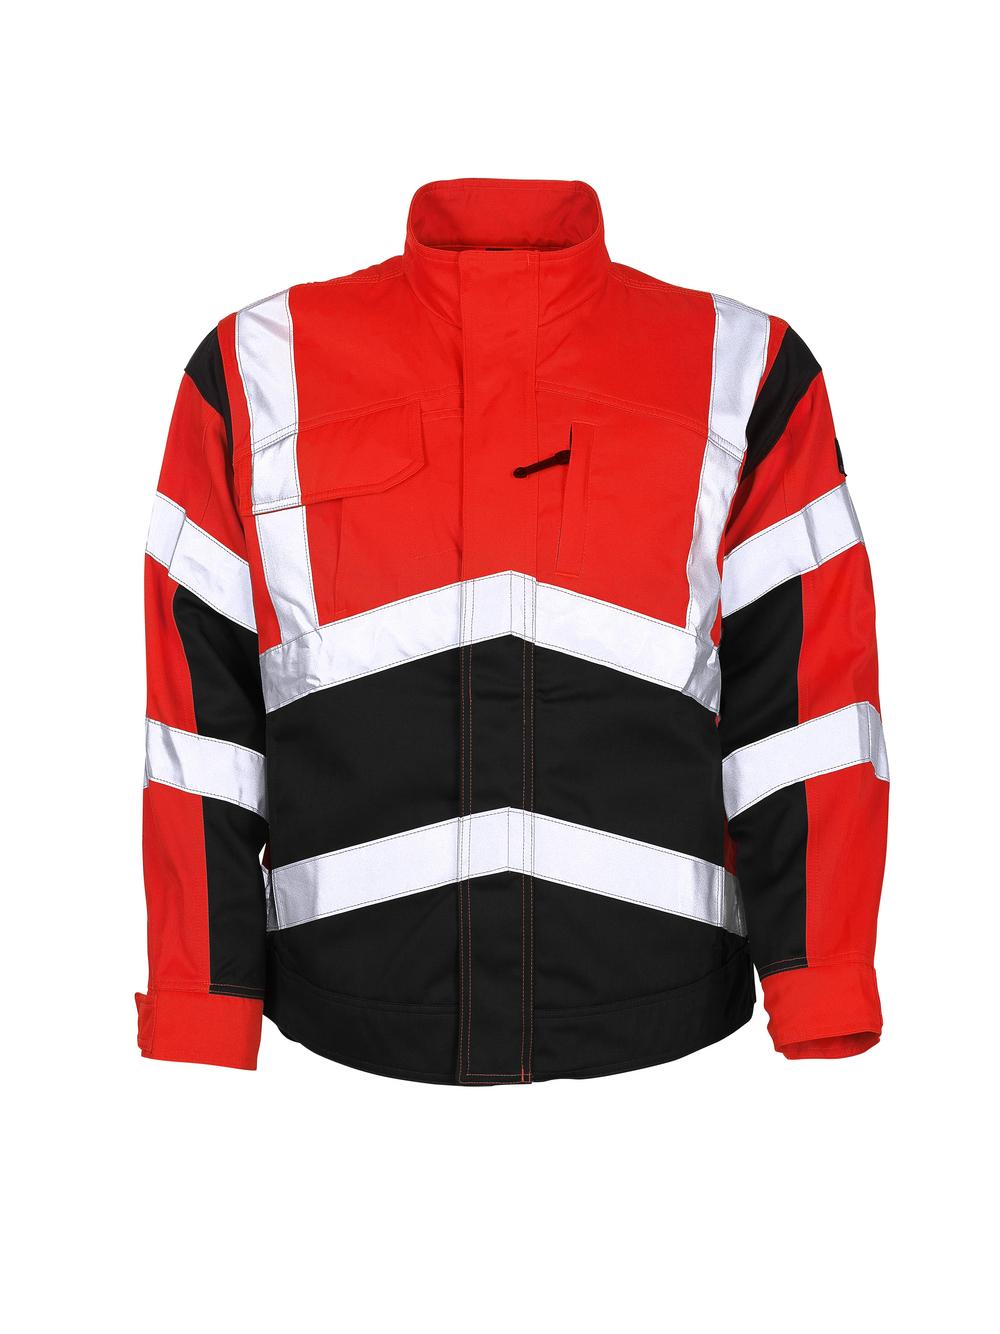 09009-860-A49 Jacket - hi-vis red/dark anthracite